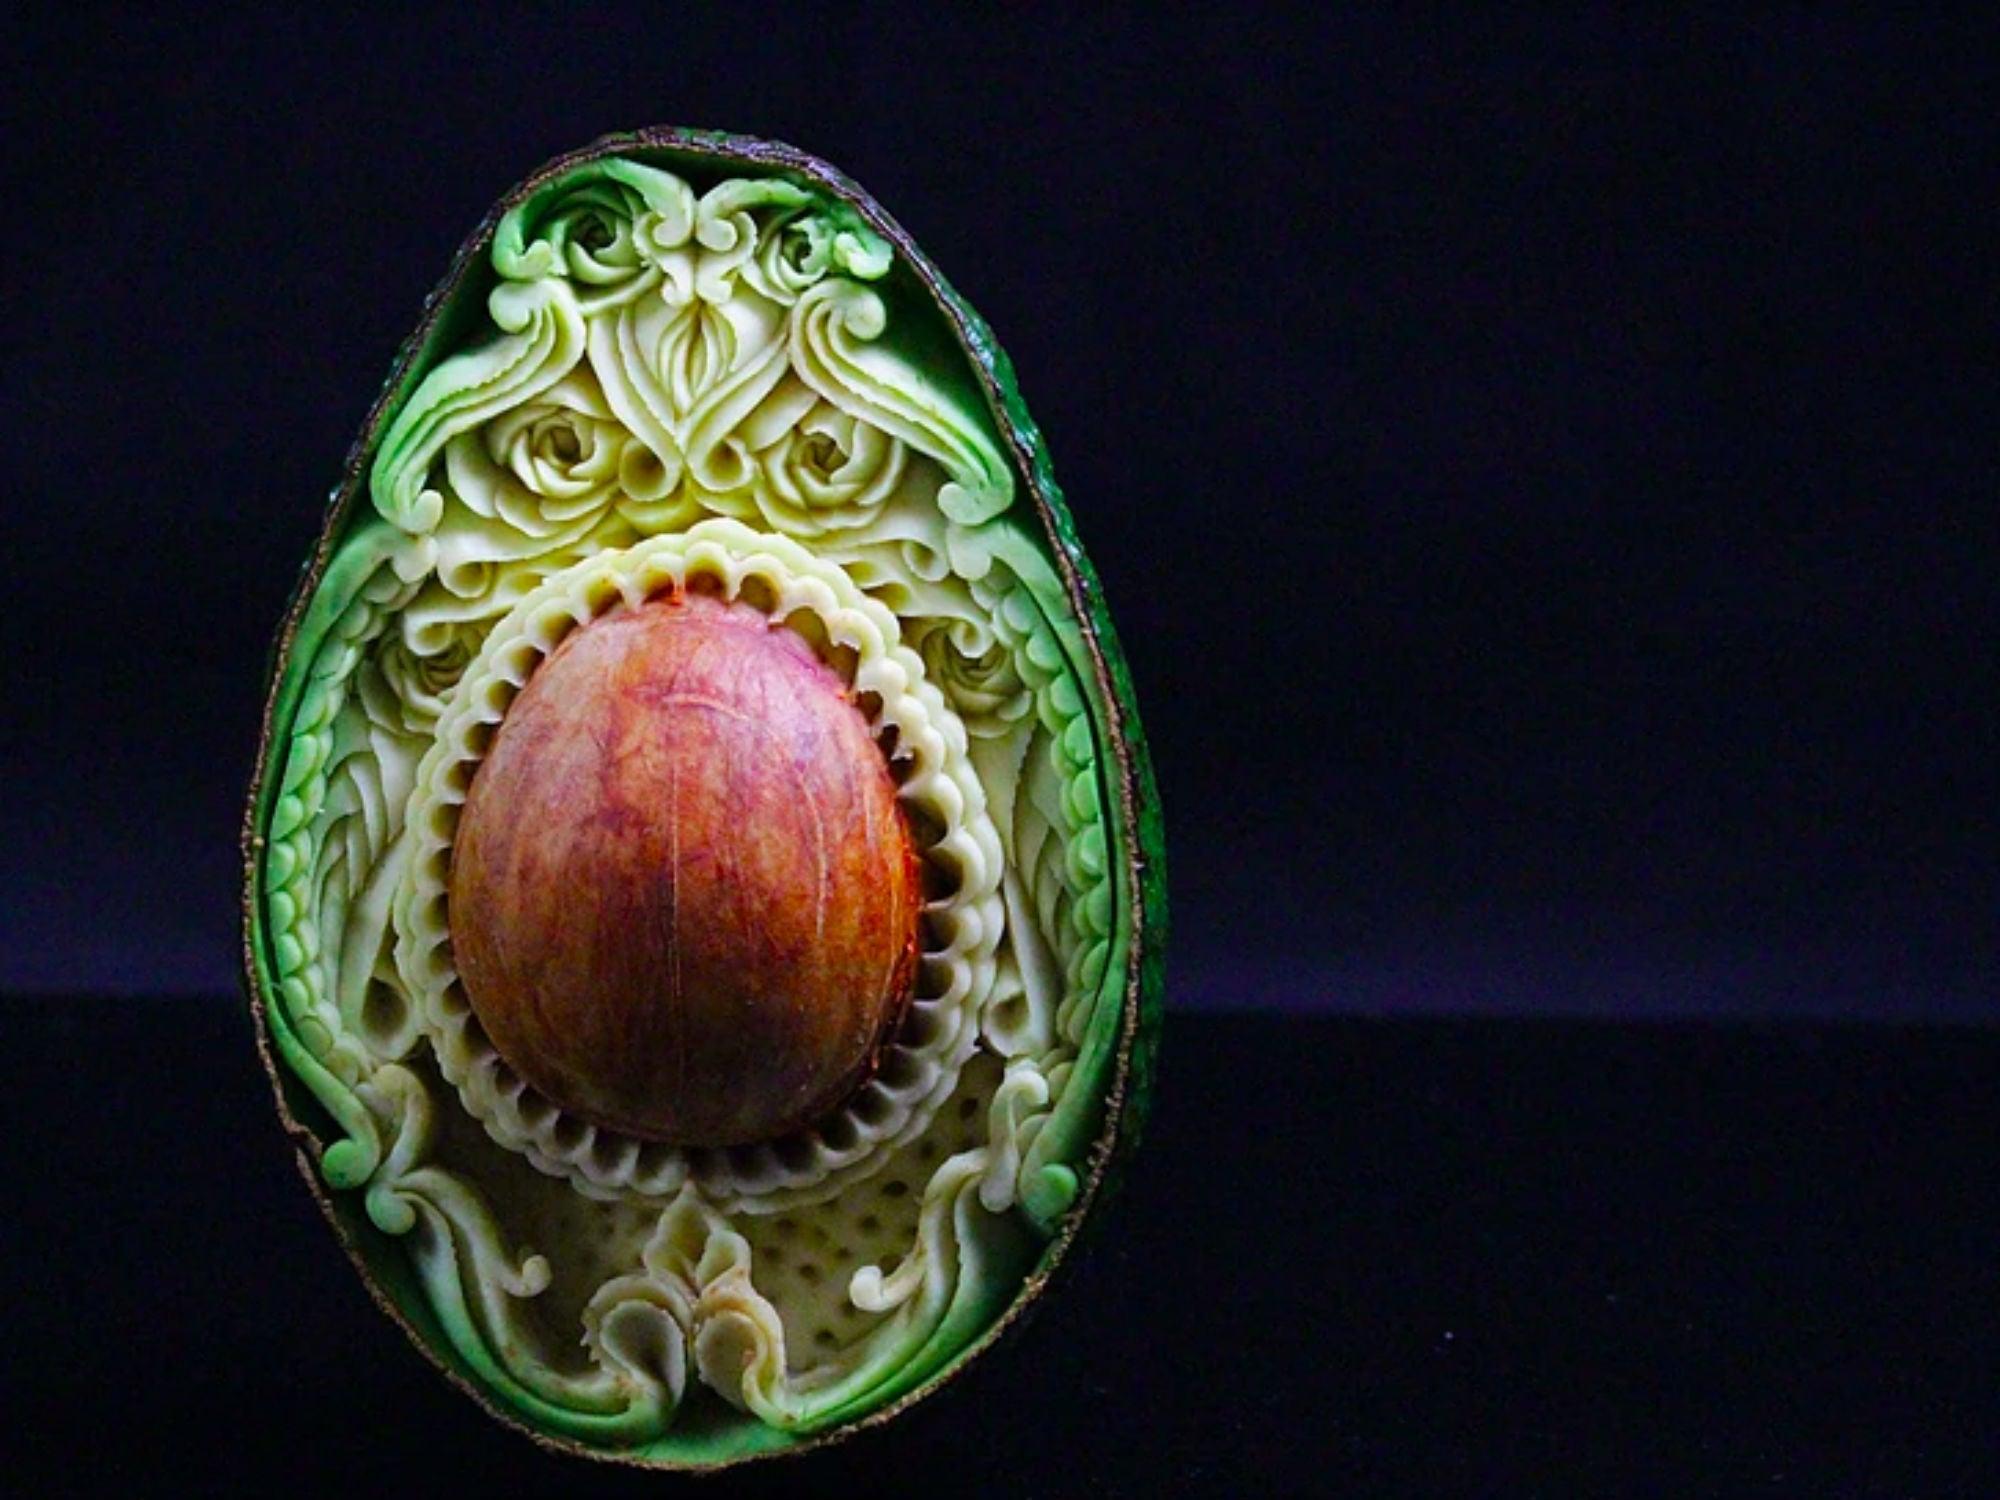 Italian Artist Turns Ordinary Foods Into Intricate Works of Art